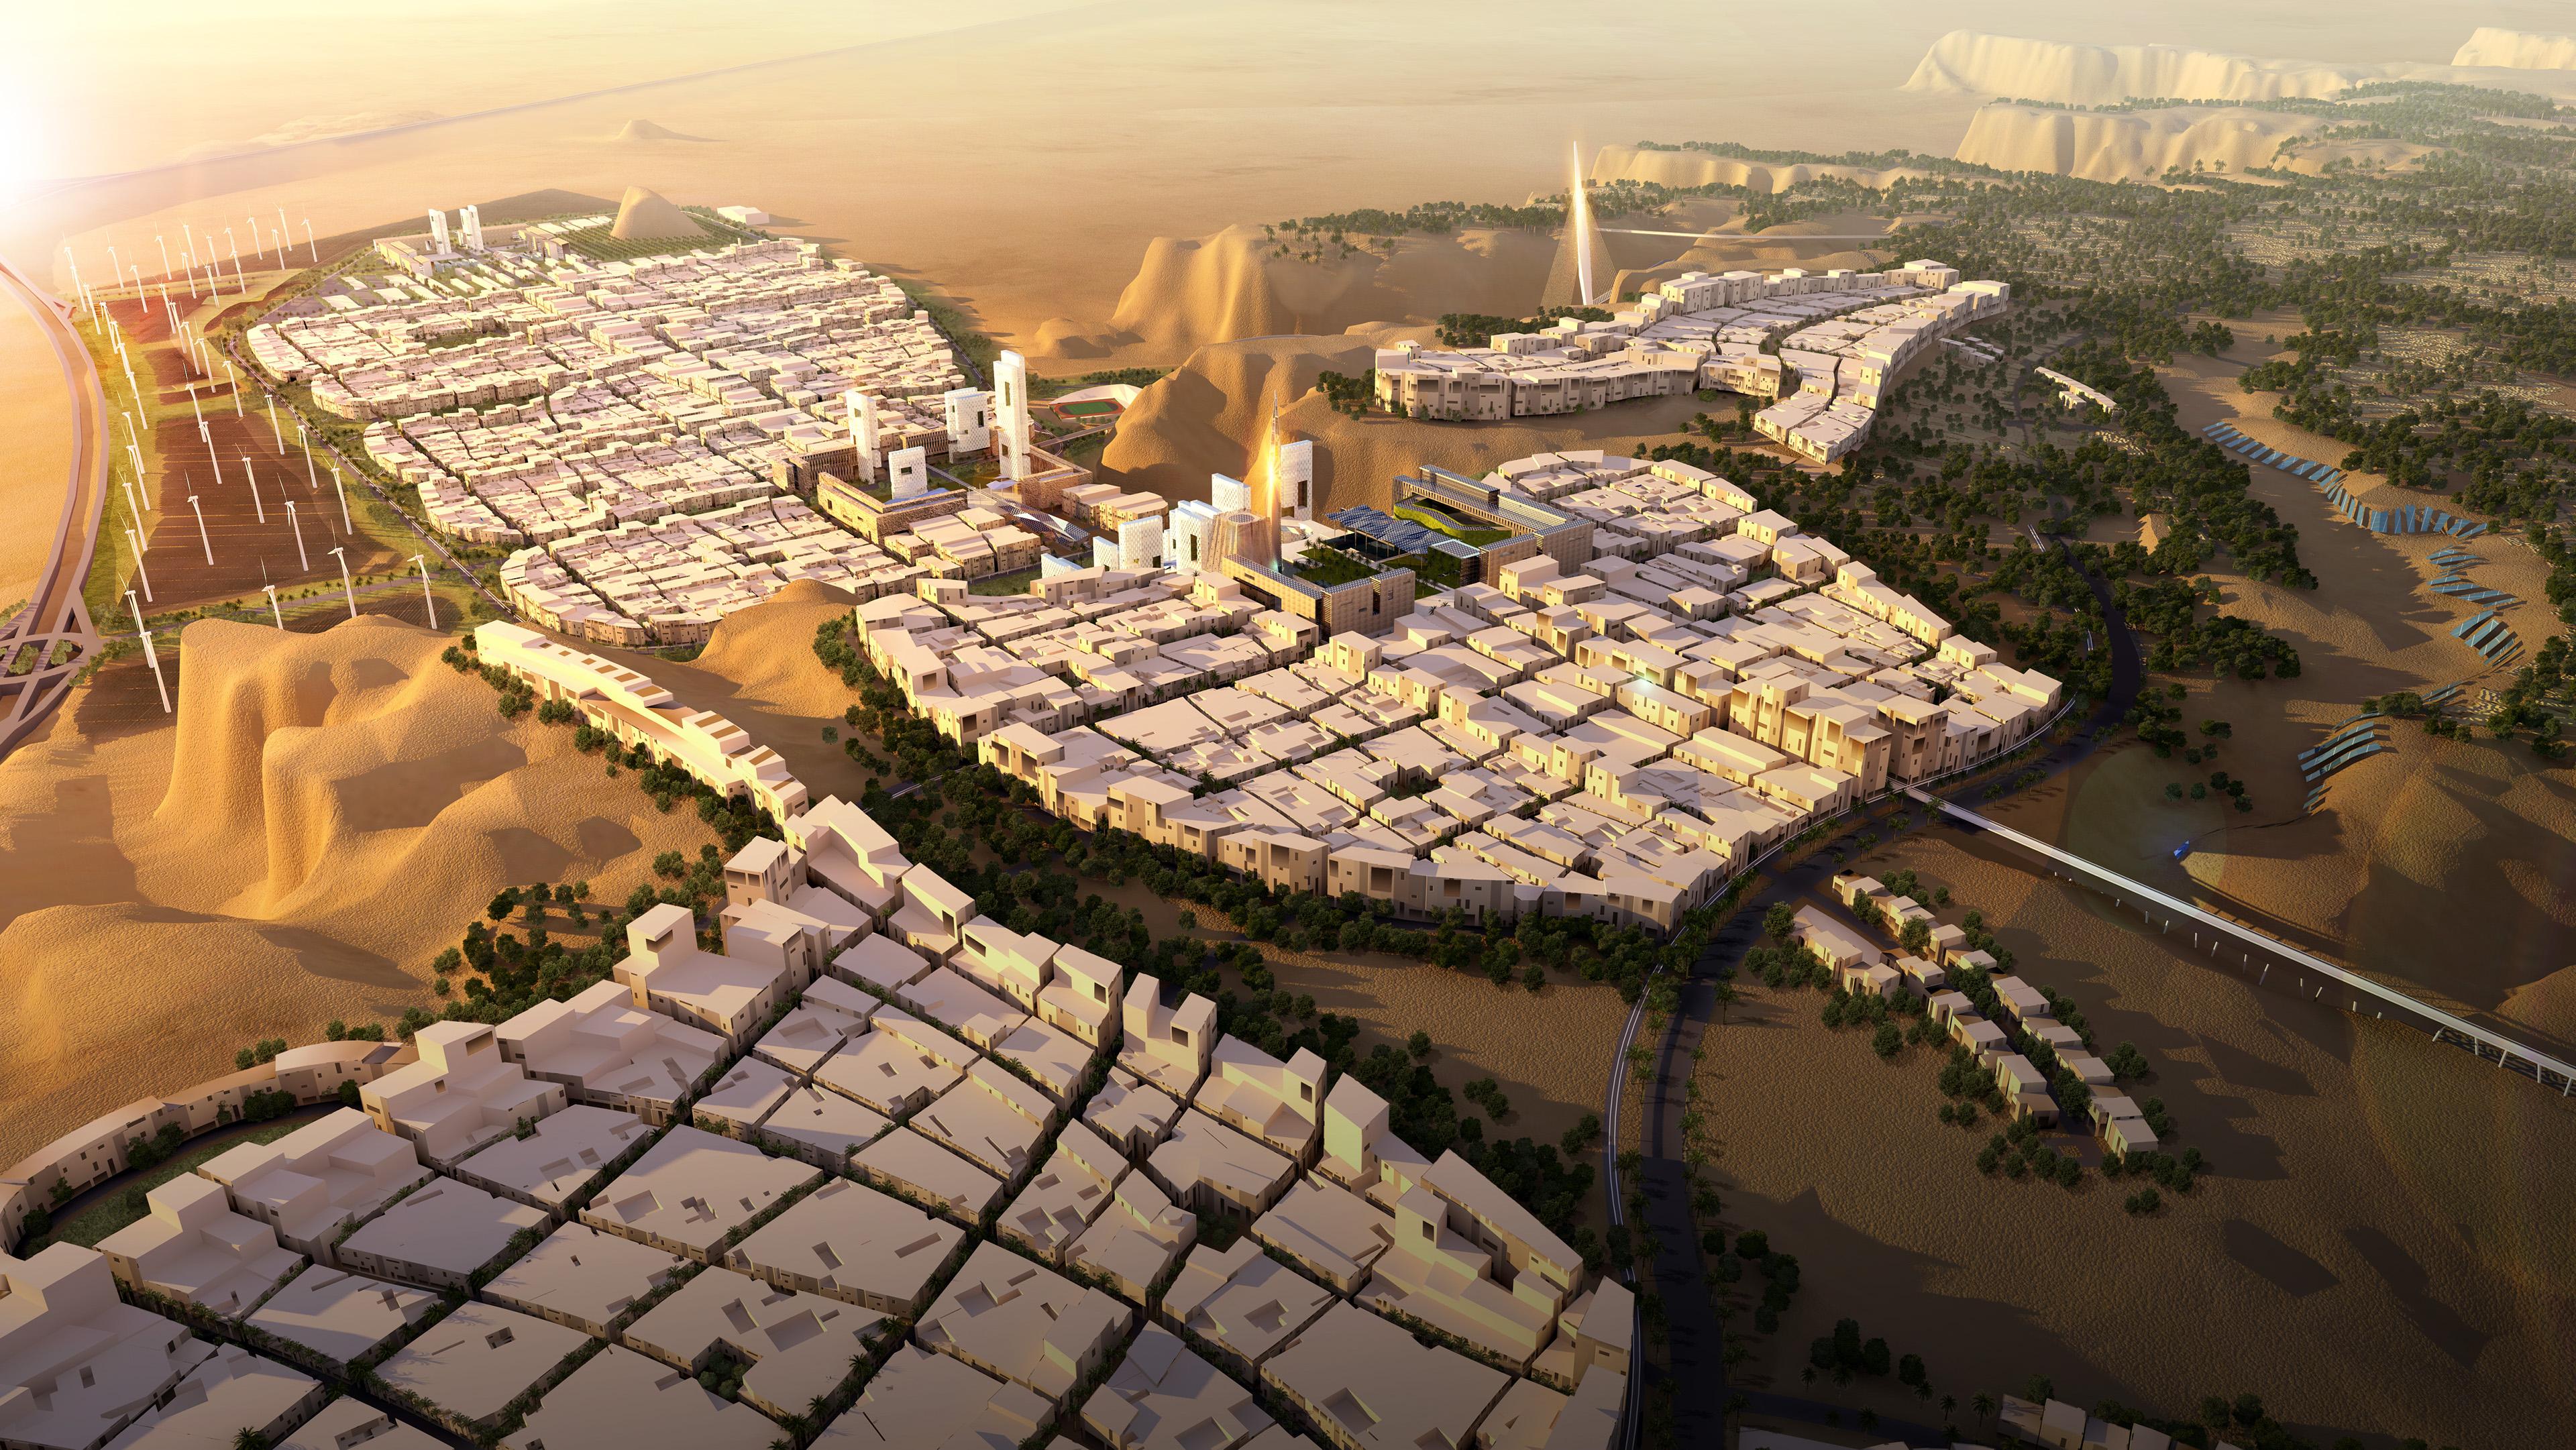 Davin Hong - King Abdullah City for Atomic and Renewable Energy